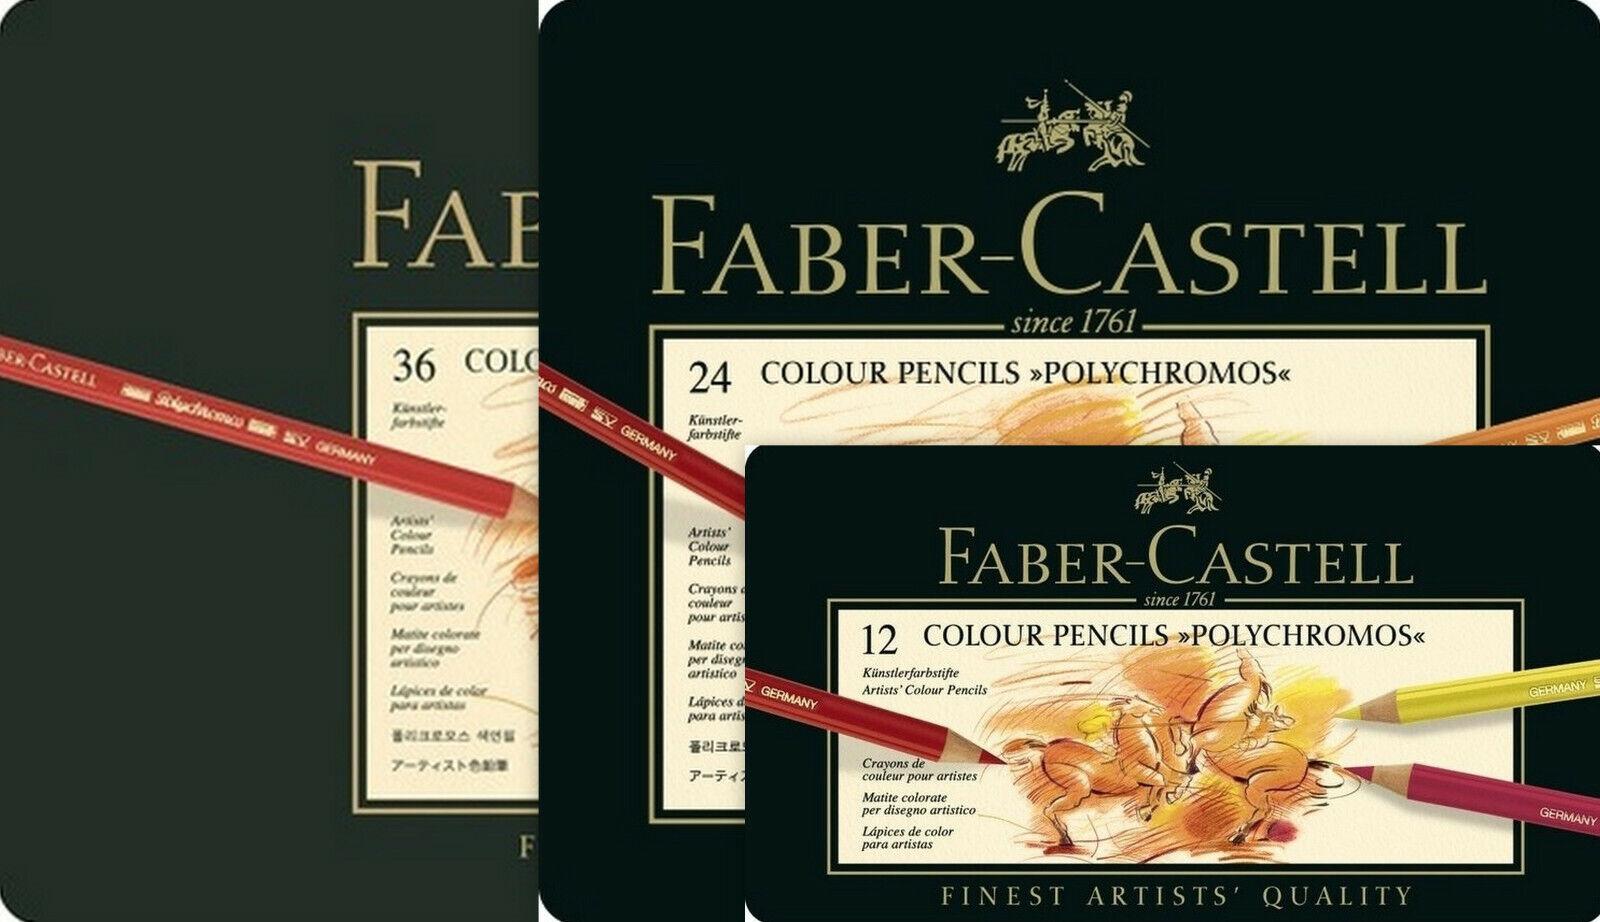 68 Faber-Castell POLYCHROMOS Farbstifte Künstlerfarbstifte Fanedition bestprice!